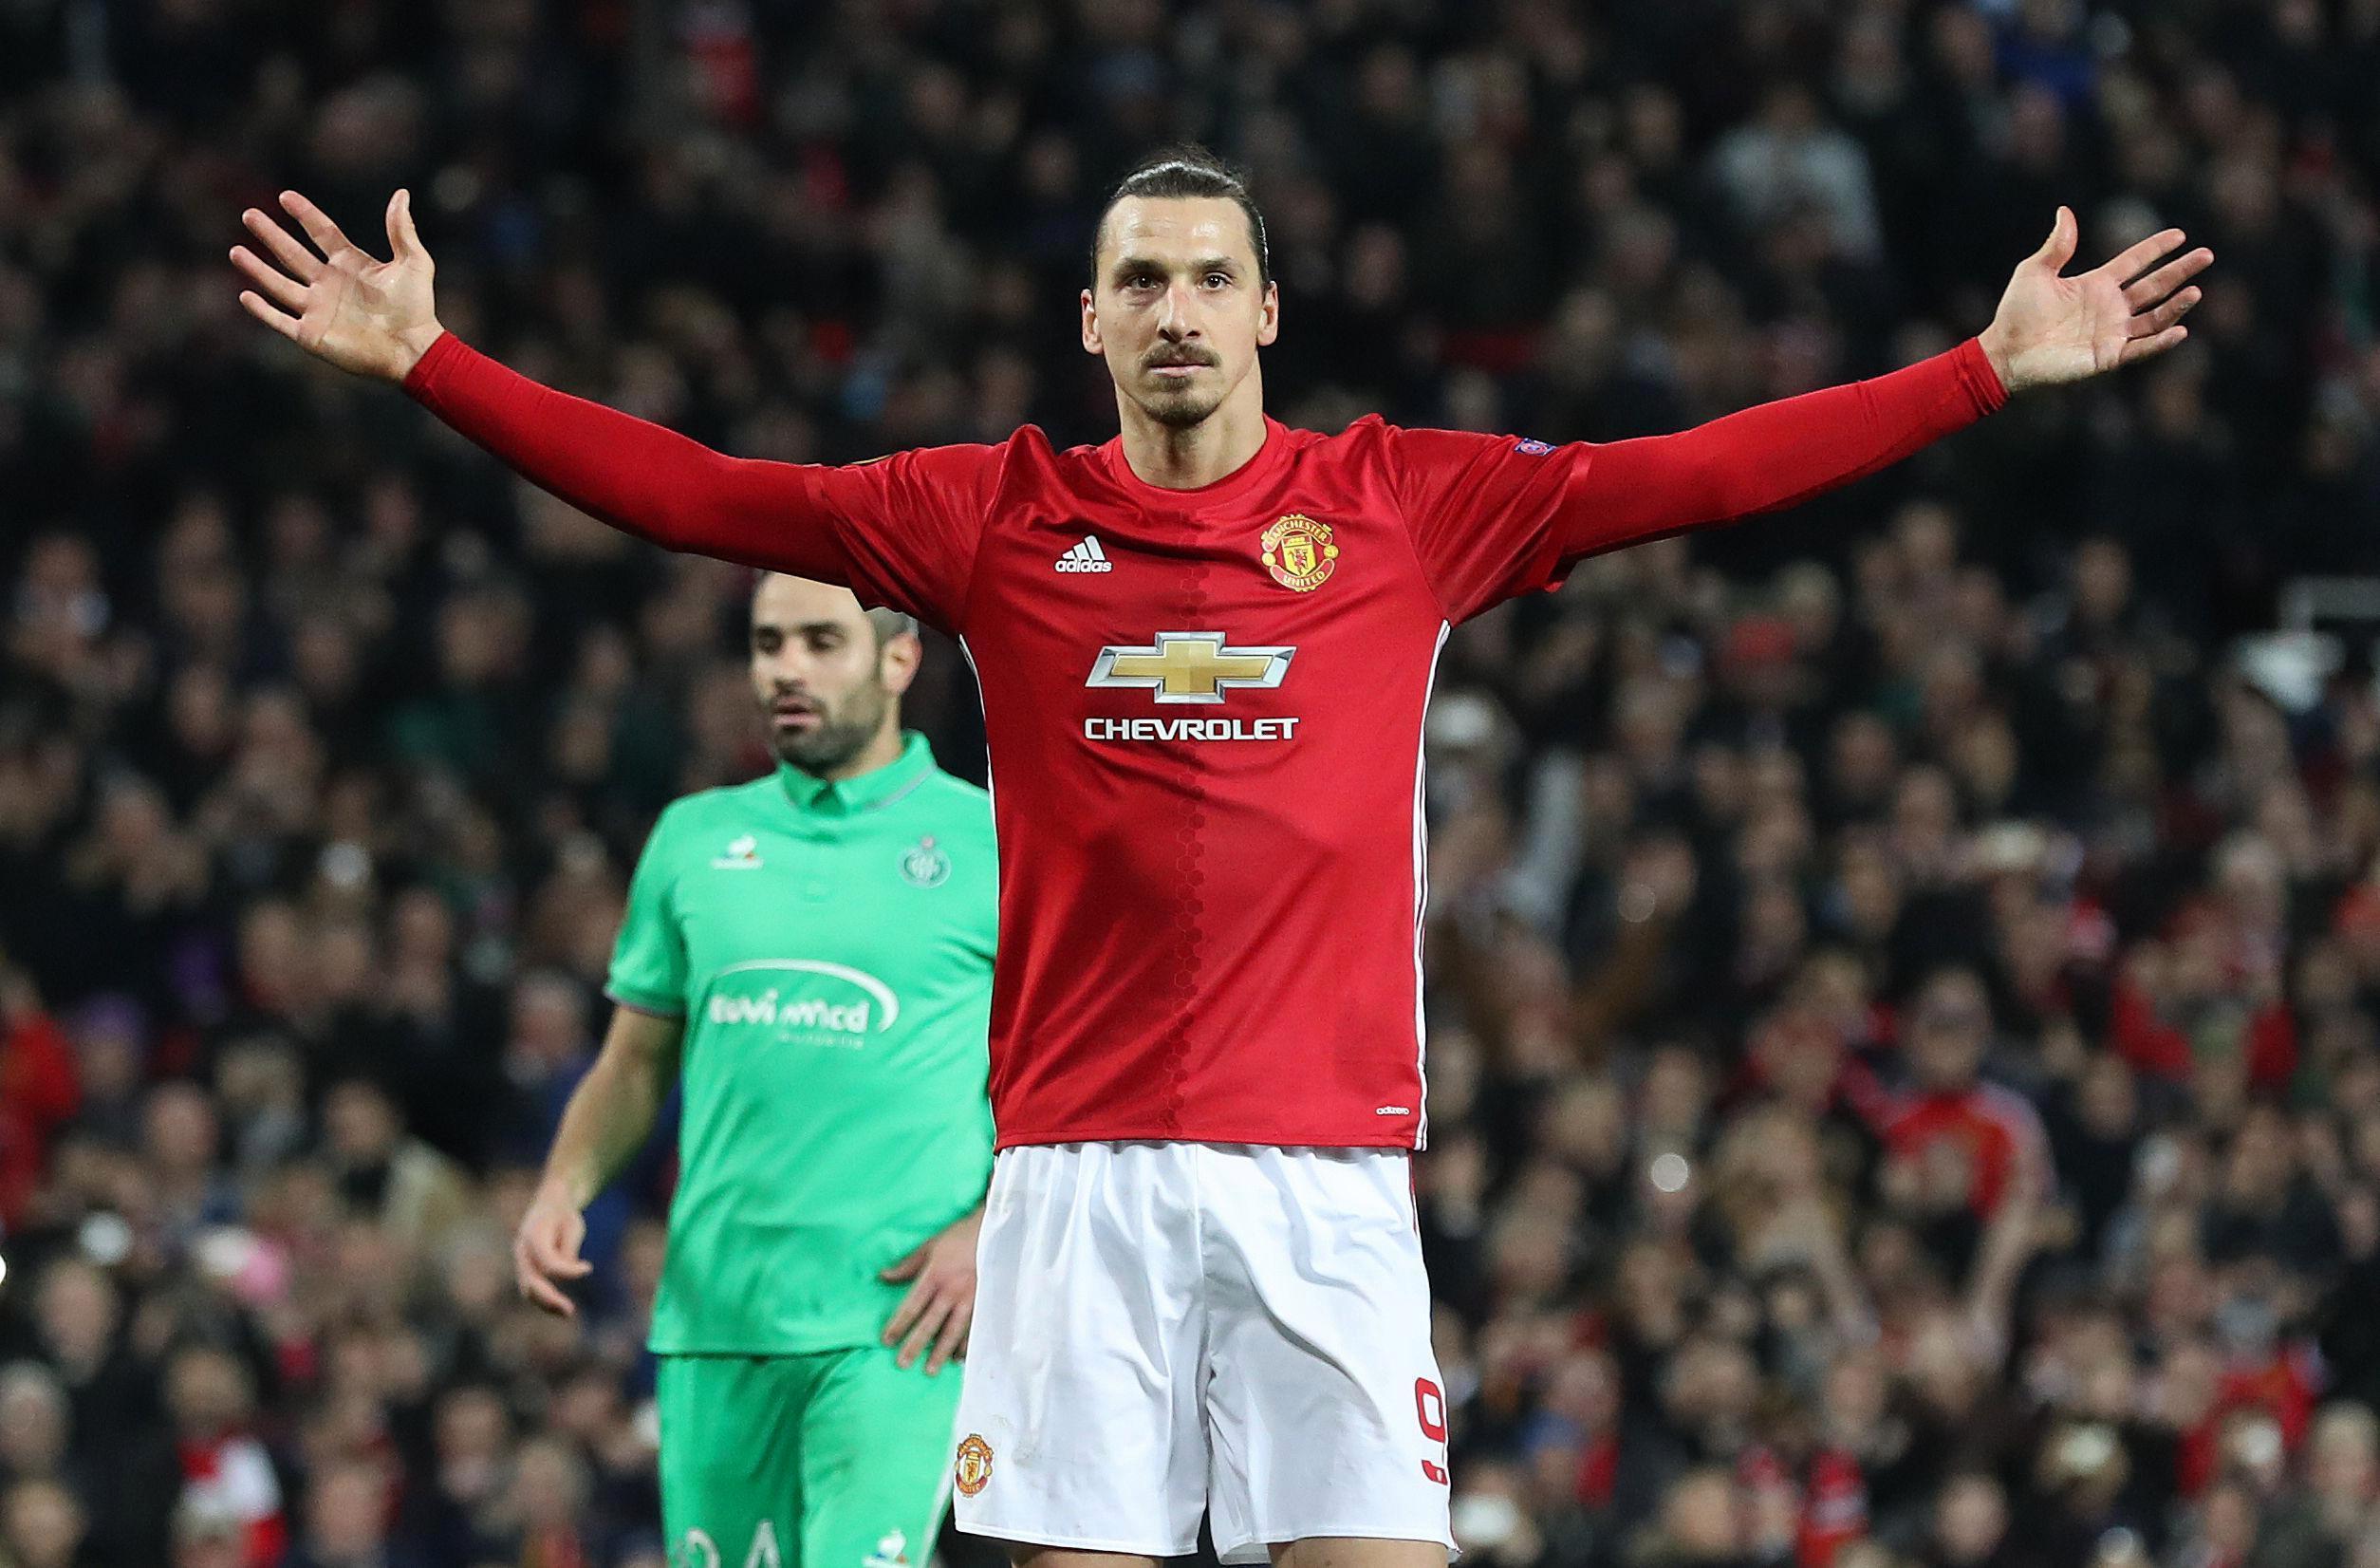 United are without talismanic striker Zlatan Ibrahimovic